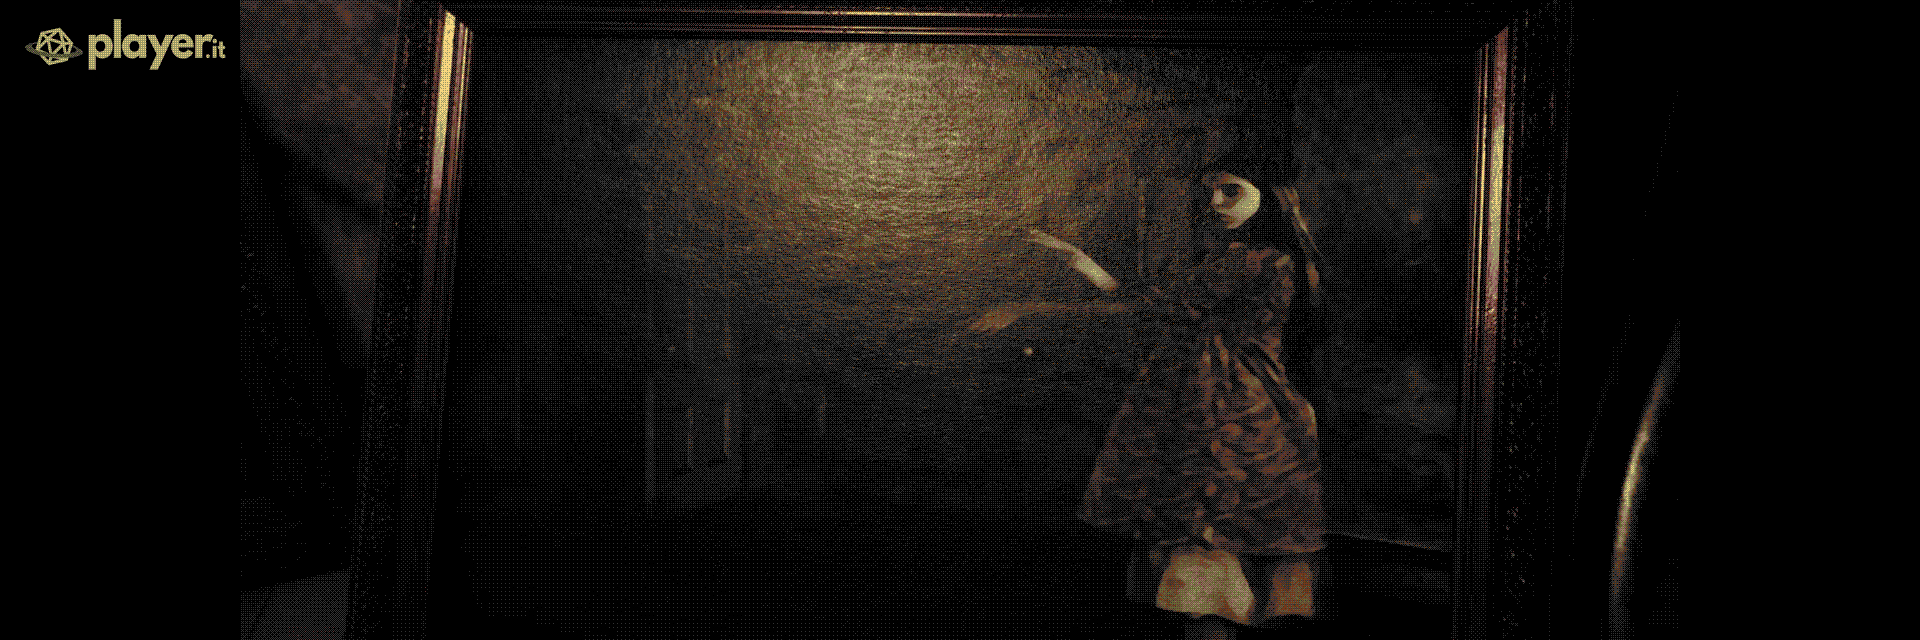 Song of Horror wallpaper scheda gioco